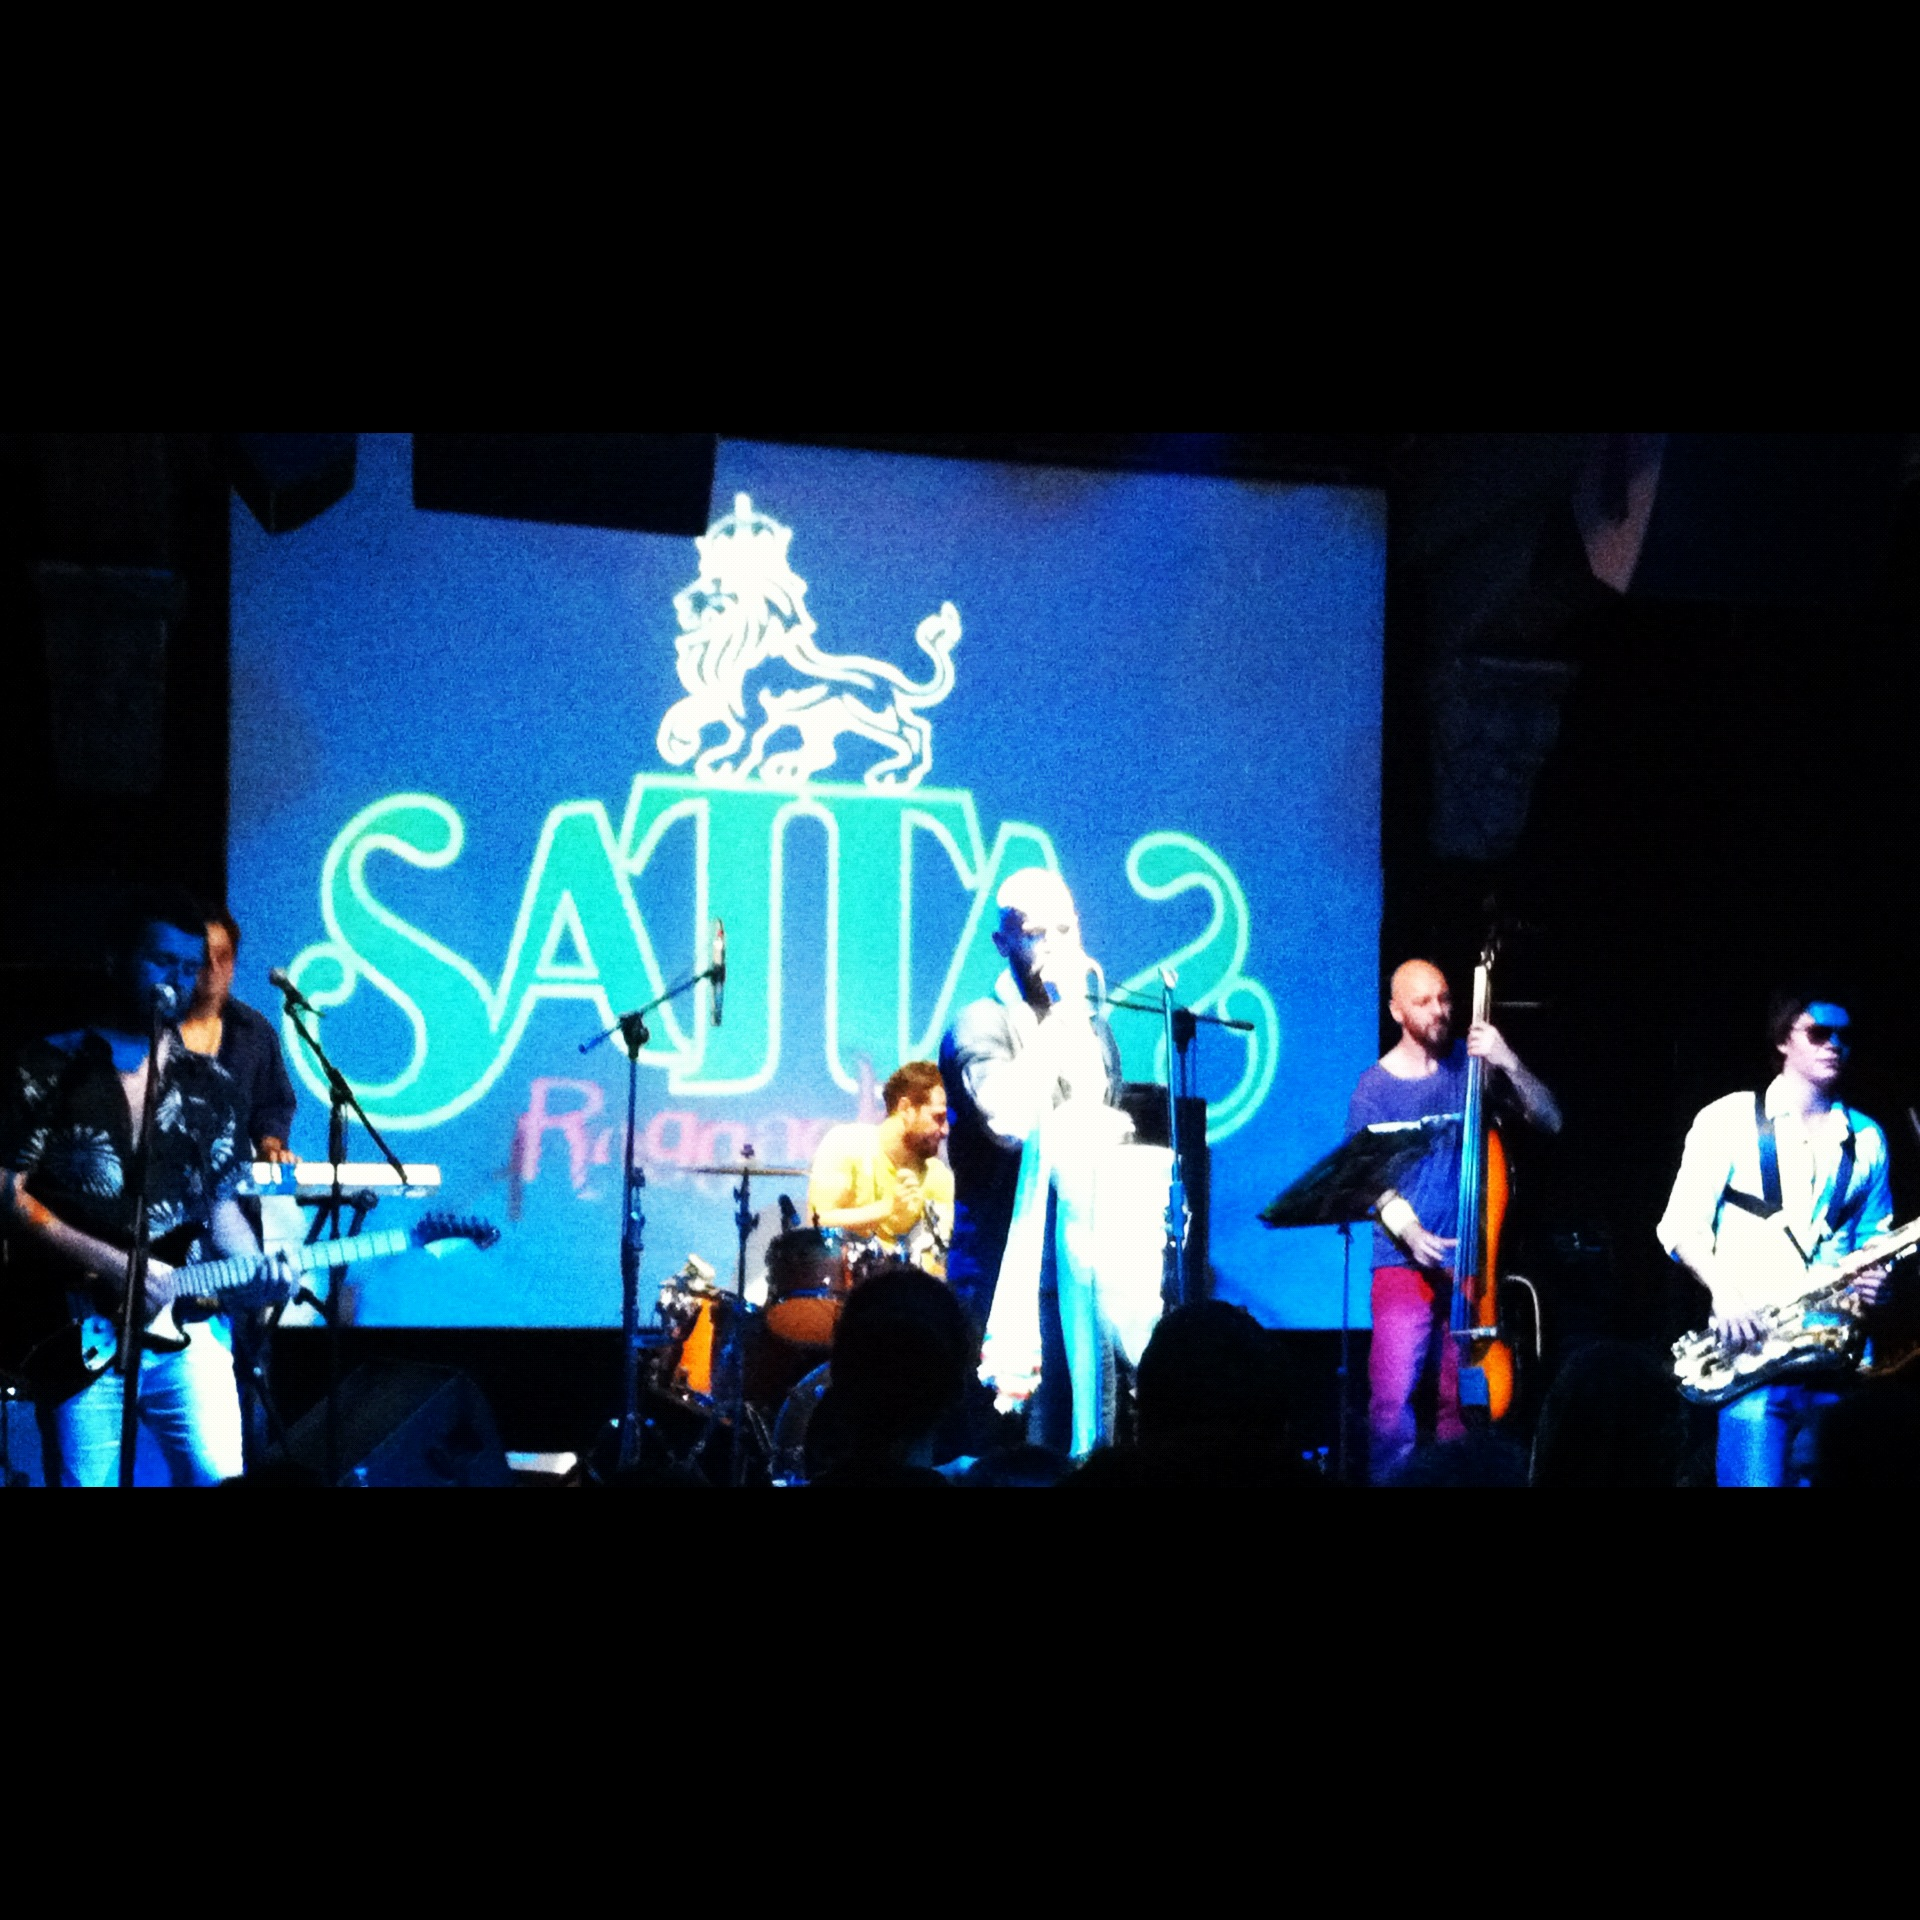 Yeni: SATTAS!